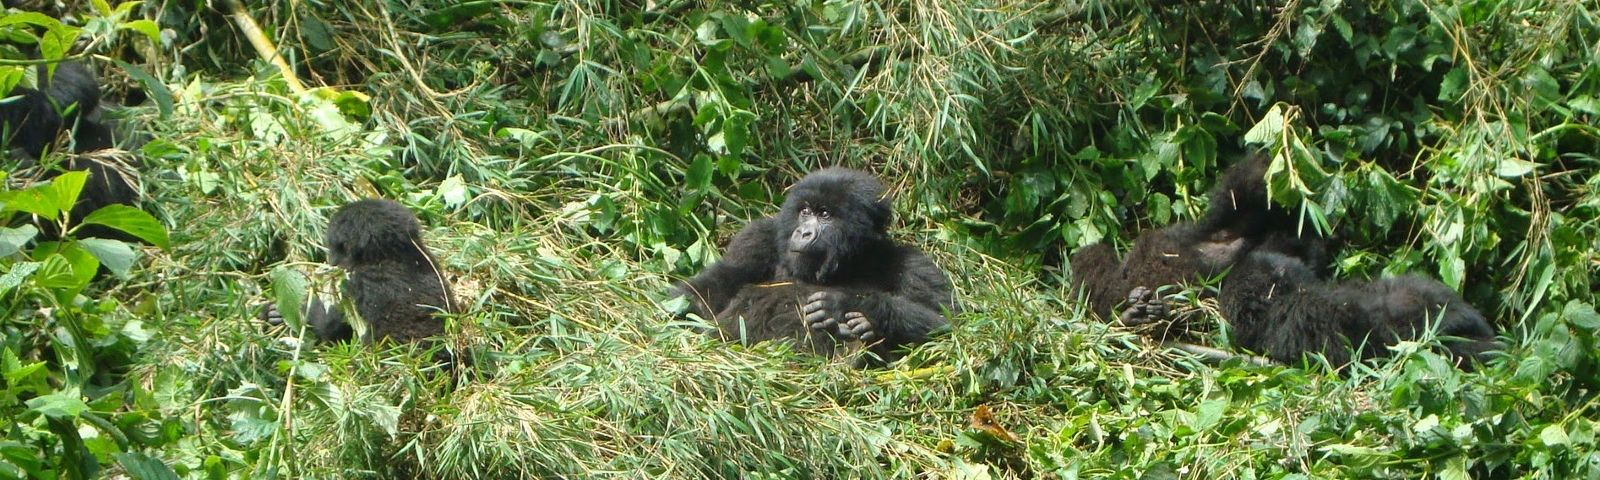 Highlights of Rwanda - Top Five Things to do in Rwanda